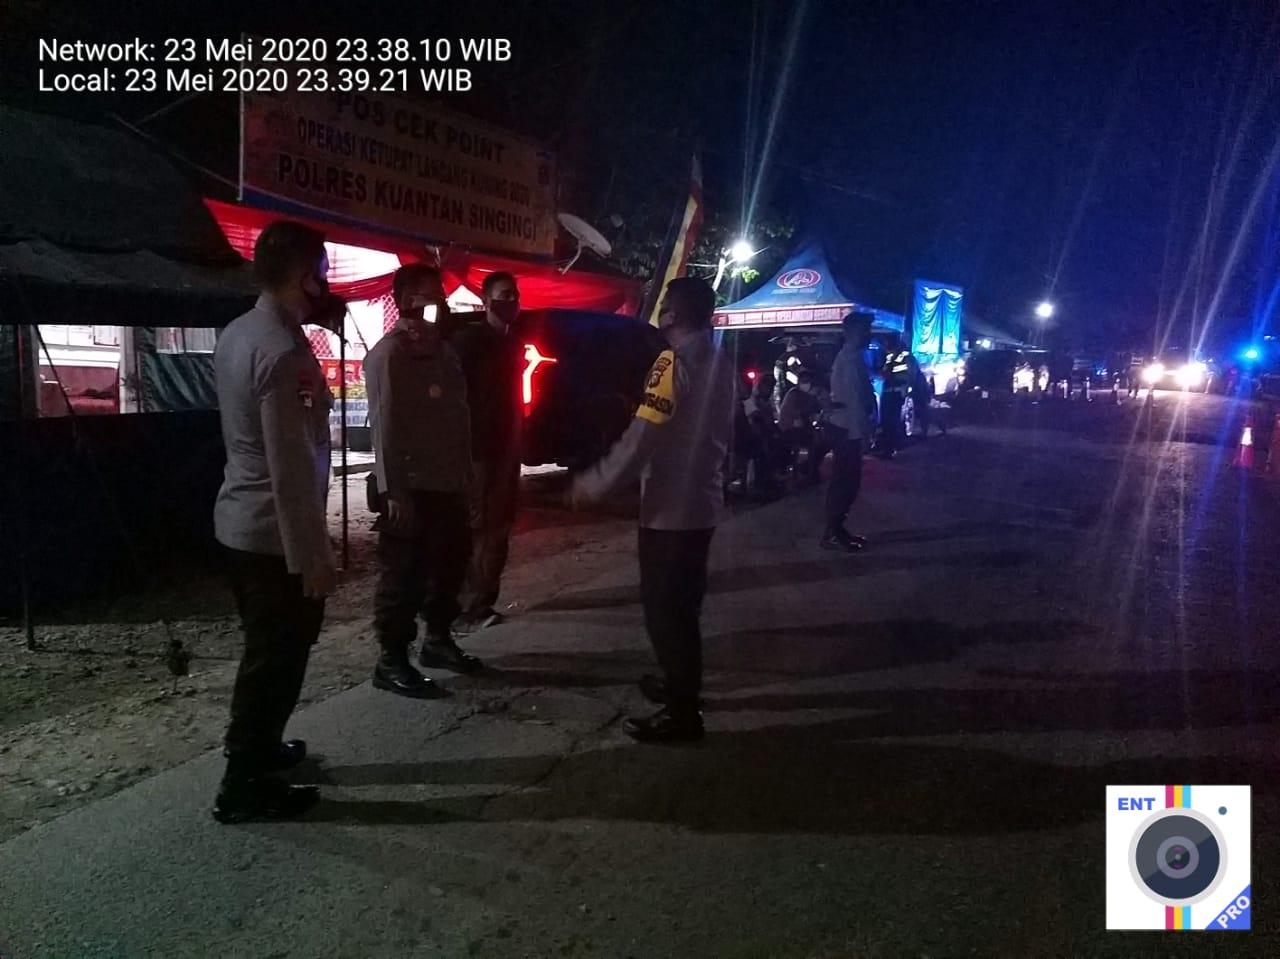 Polres Kuansing Perketat Perbatasan Riau-Sumbar Dalam Rangka Pembatasan Perjalanan Orang Menjelang Idul Fitri 1441 H Guna Mencegah Penyebaran Covid 19